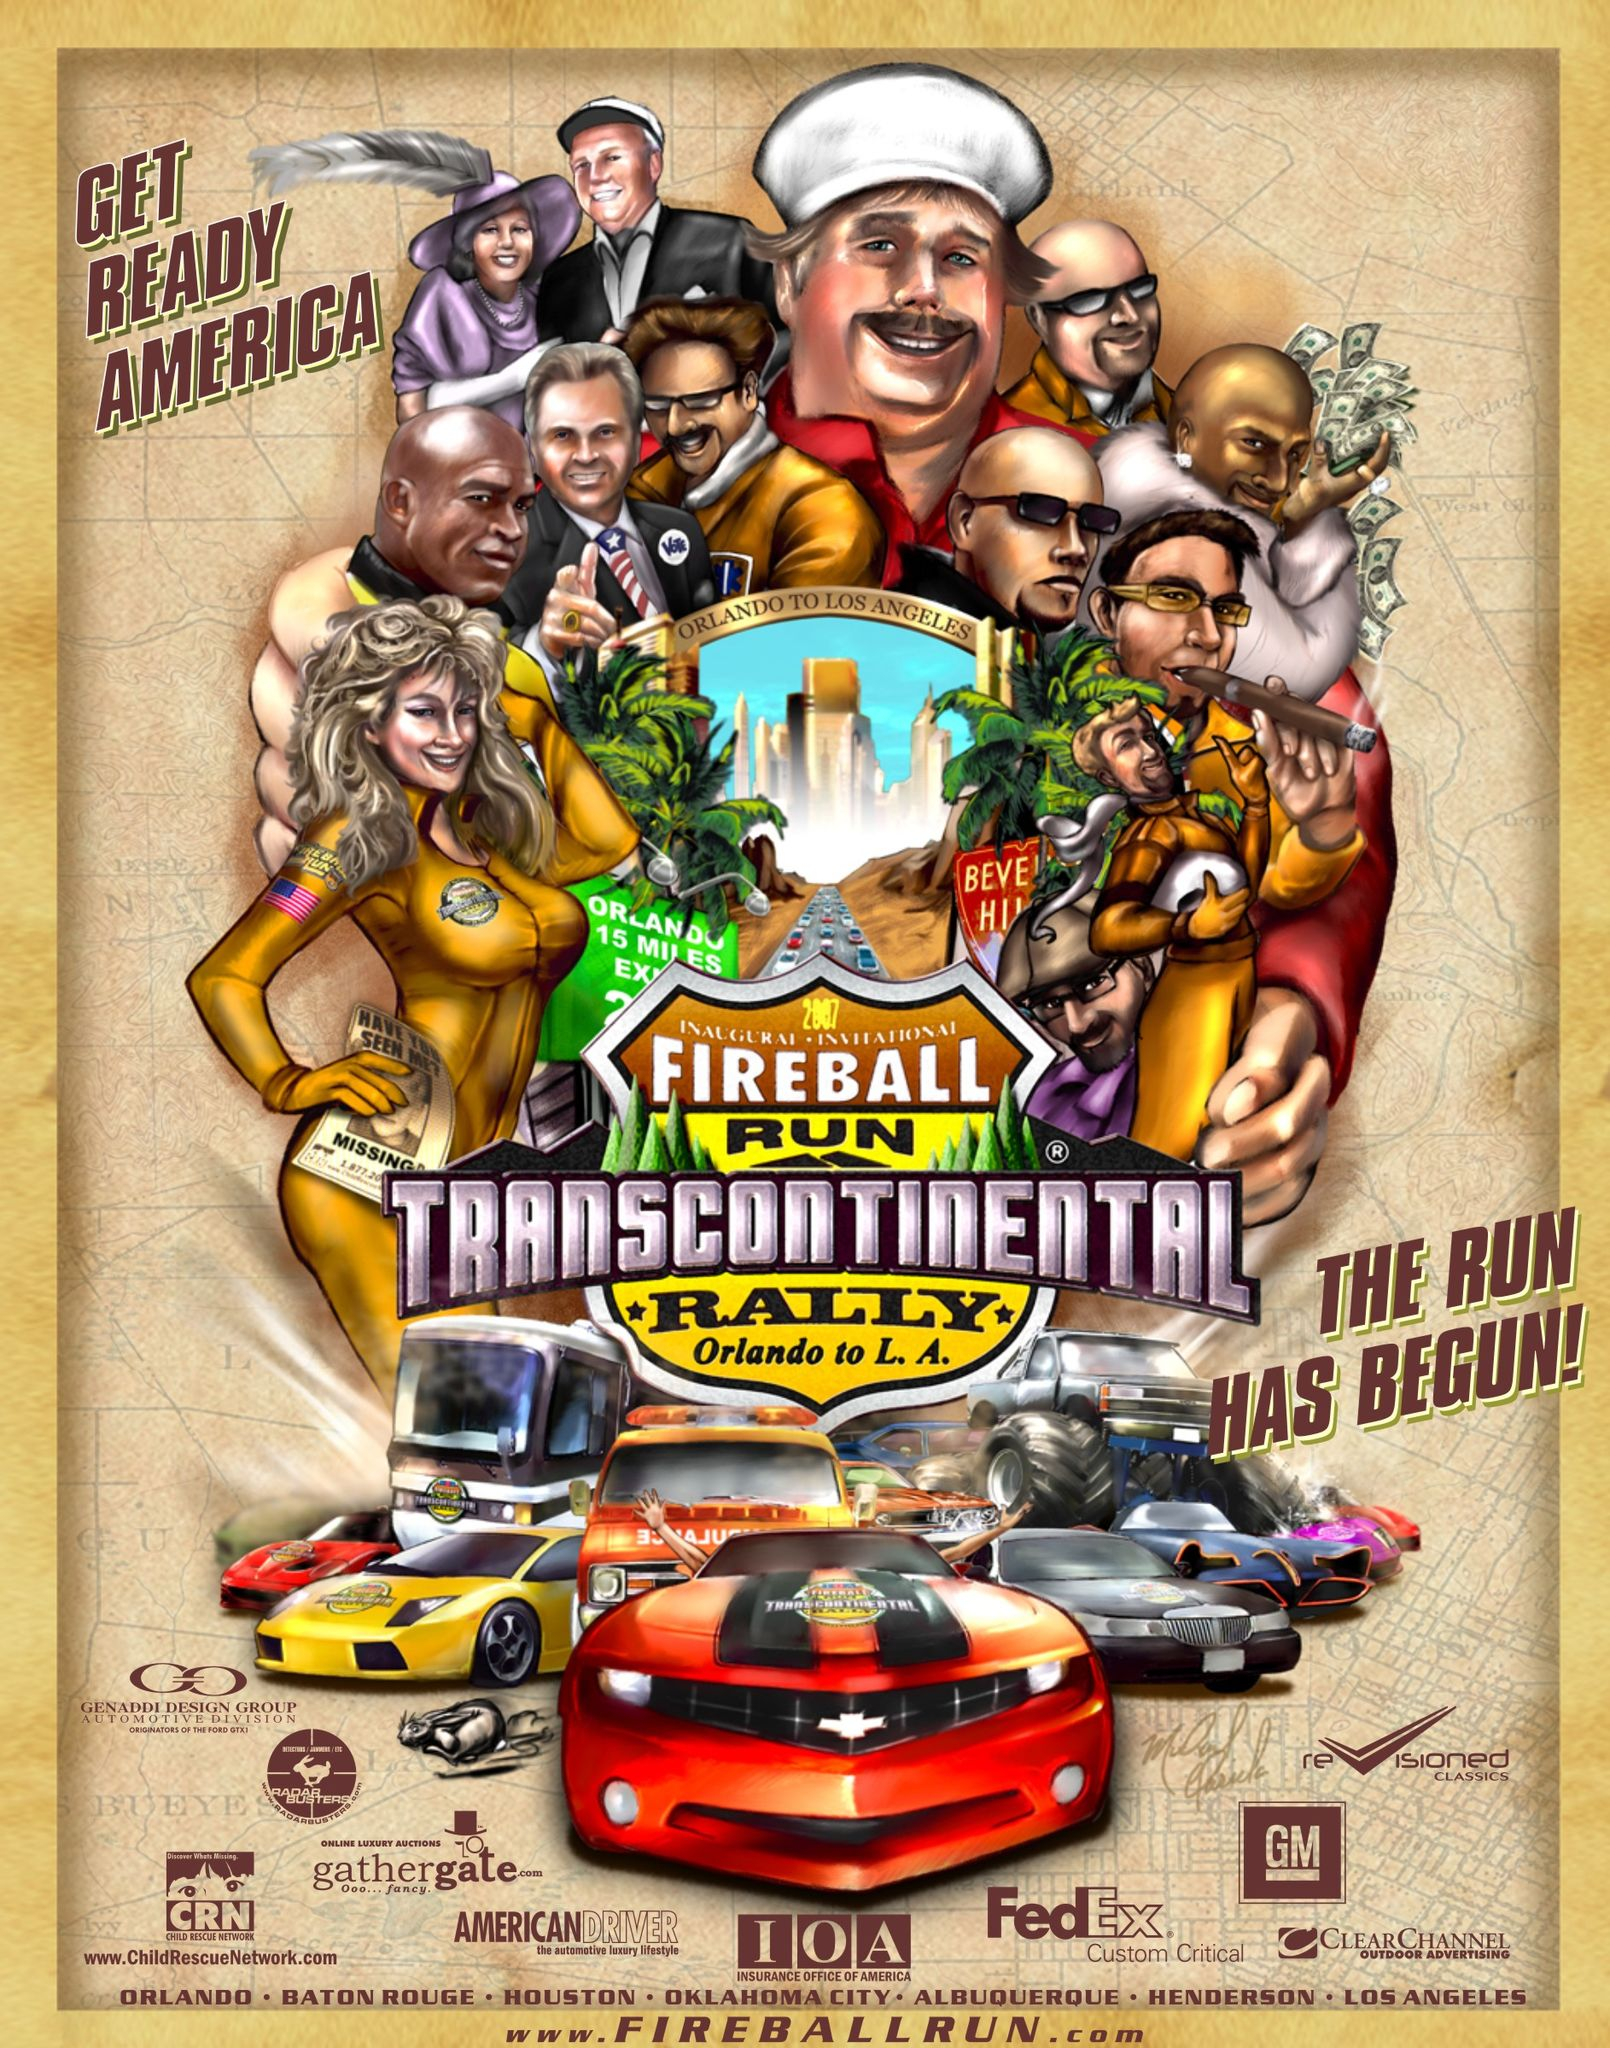 The Fireball Run